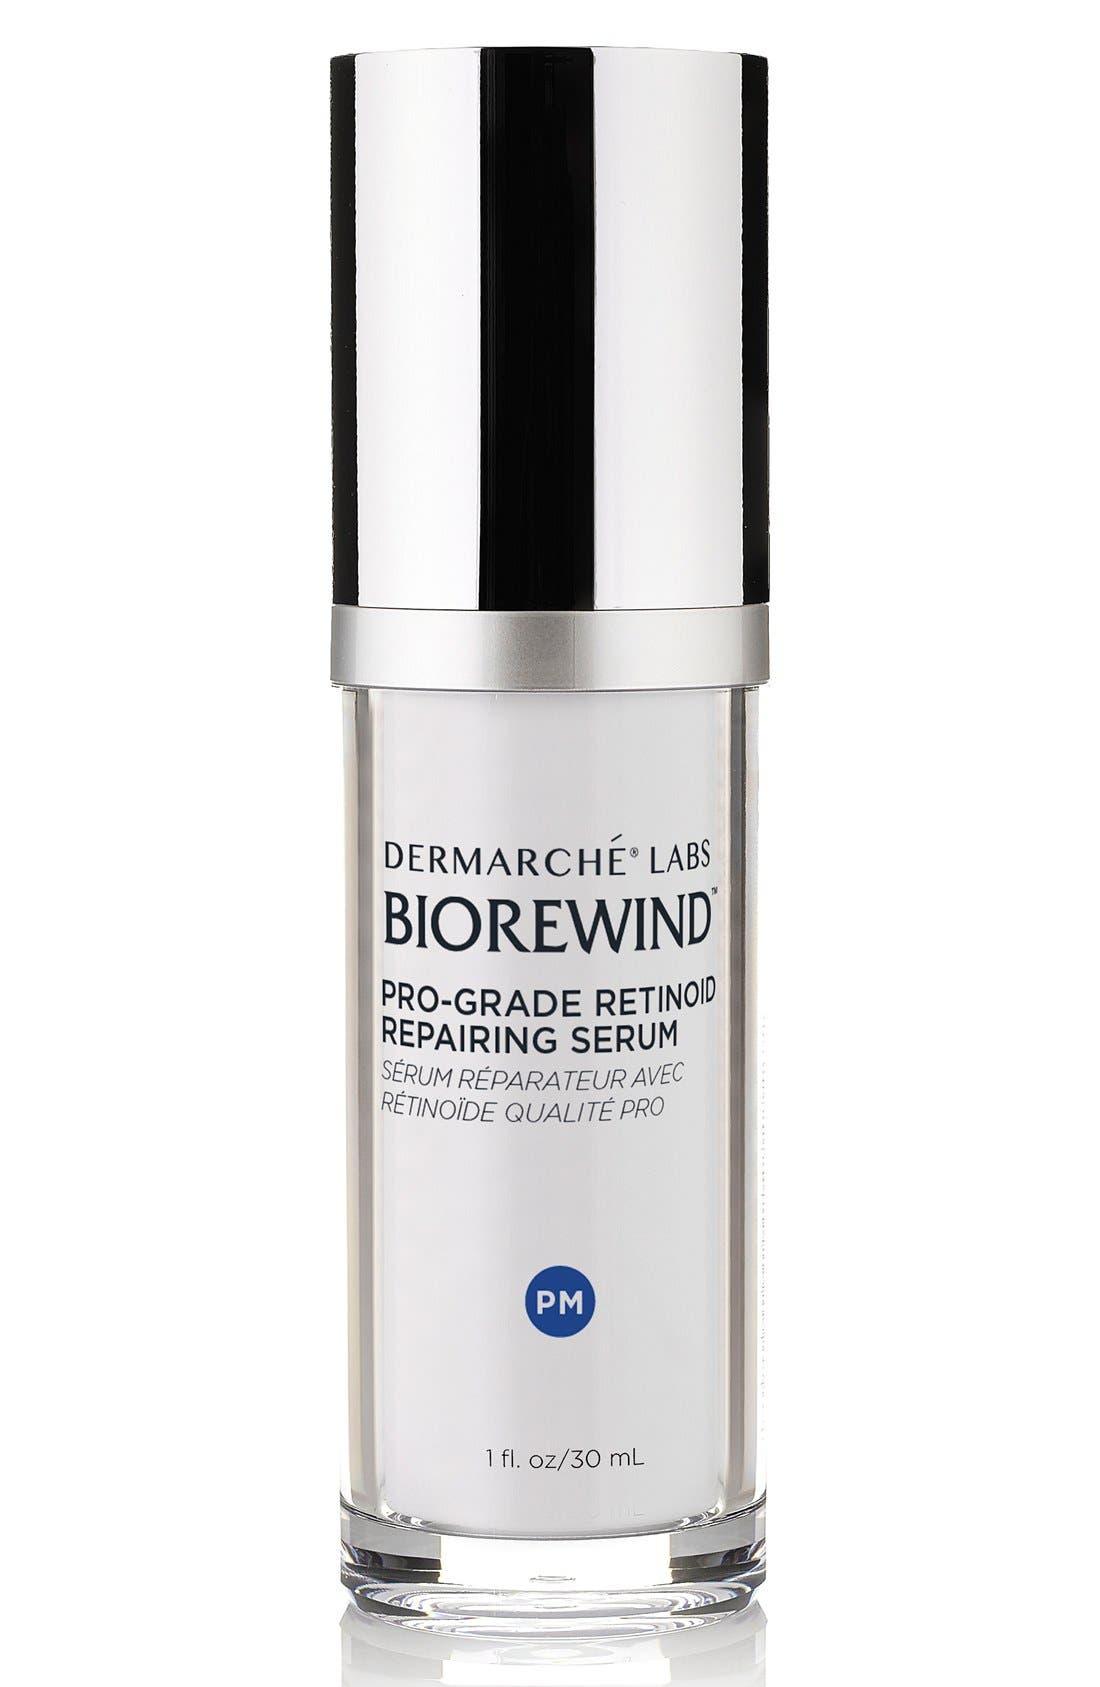 Dermarché<sup>®</sup> Labs 'BioRewind PM' Pro-Grade Retinoid Repairing Serum,                             Main thumbnail 1, color,                             NO COLOR